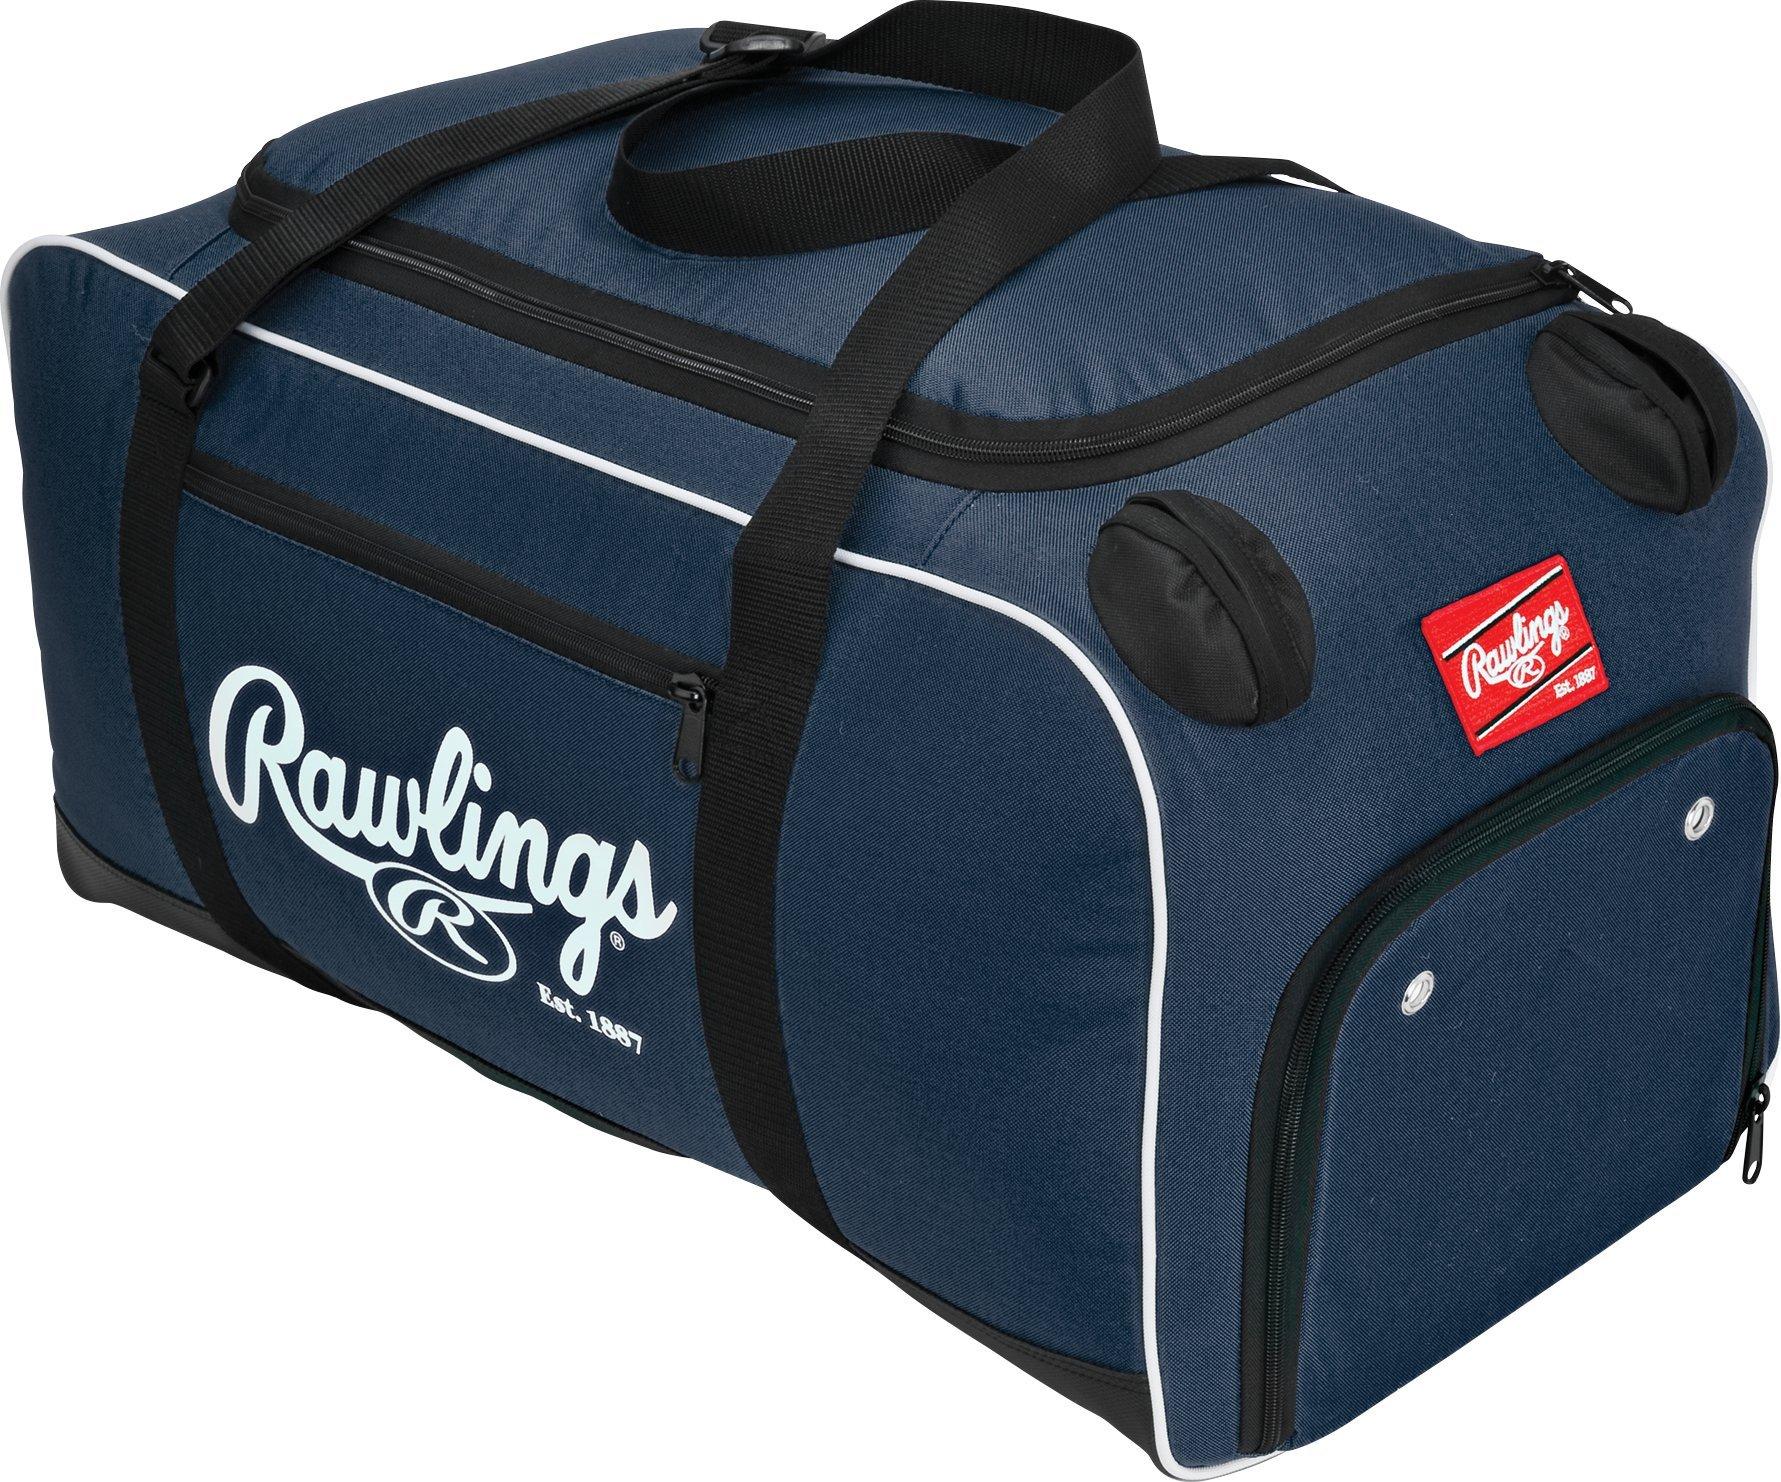 Rawlings Covert Player Duffle Bag by Rawlings